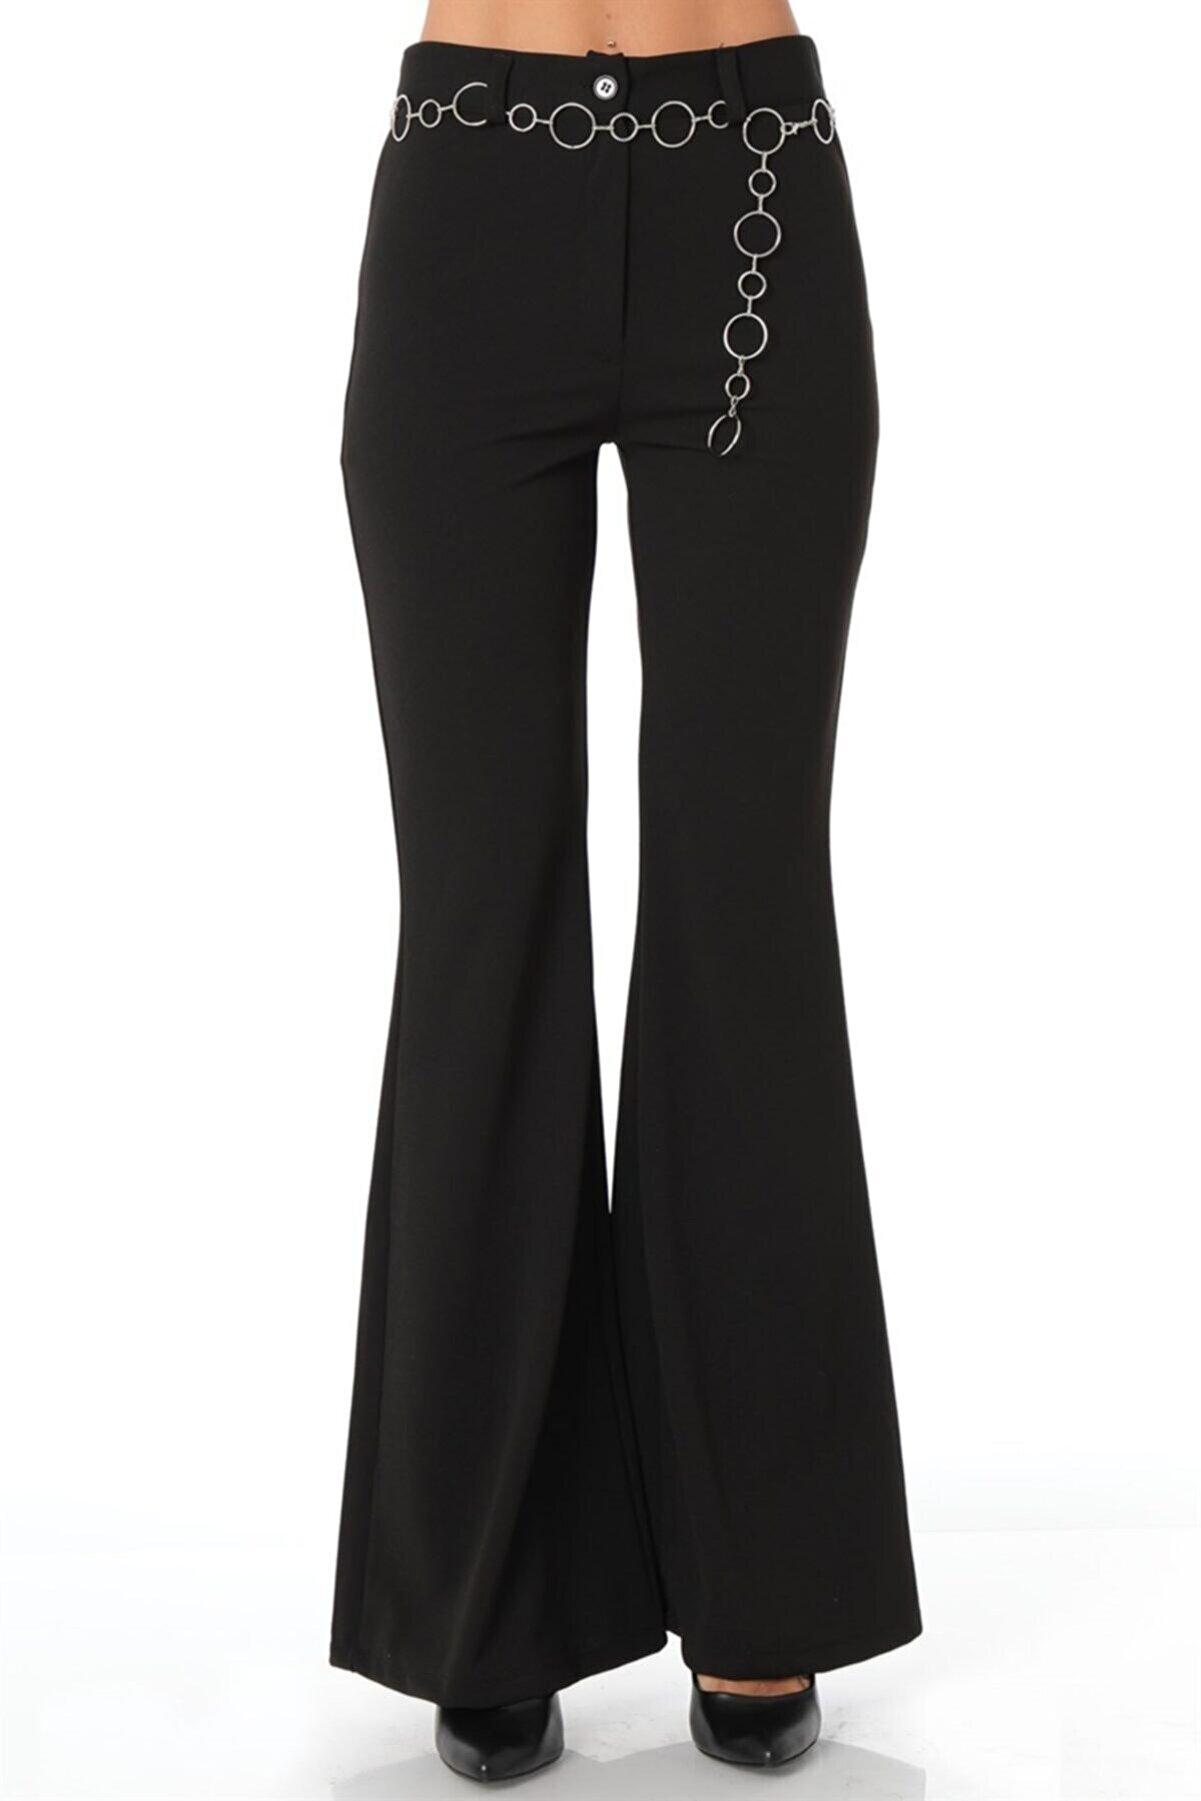 ZİNCiRMODA Ispanyol Paça Zincir Aksesuarlı Kumaş Pantolon - Siyah